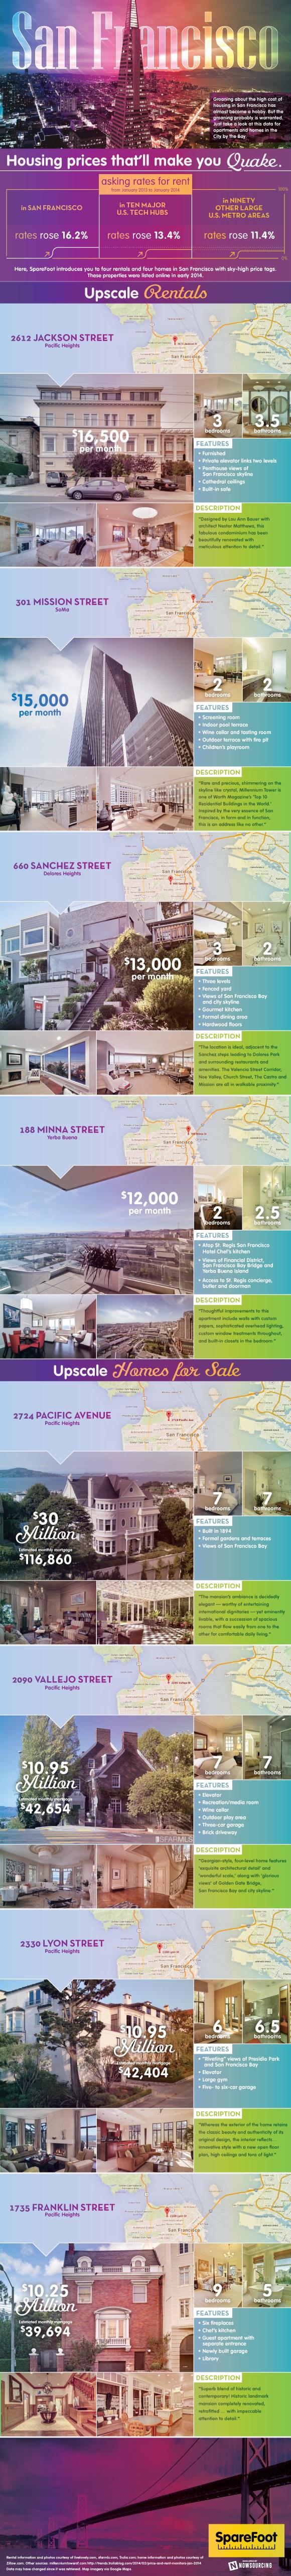 Housing Prices That'll Make You Quake